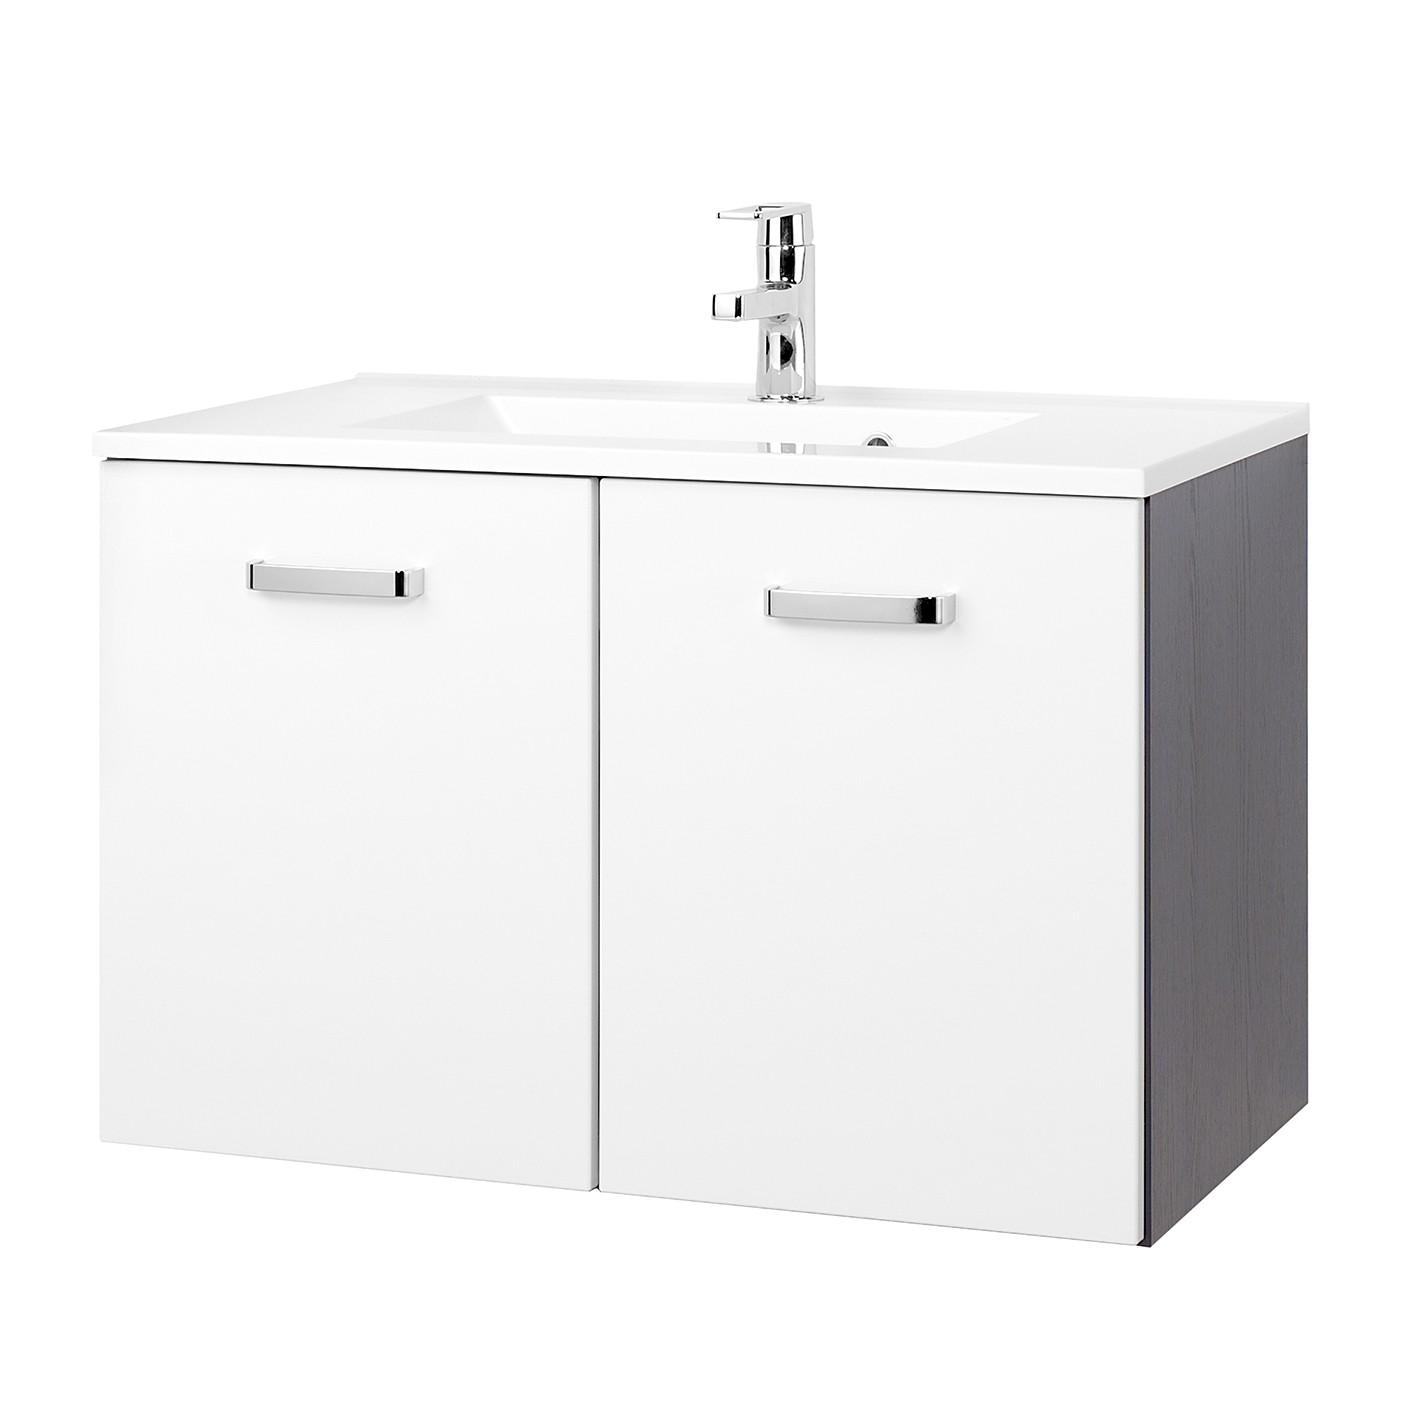 Mobile lavabo Zeehan - Bianco / Grigio - 80 cm, Giessbach